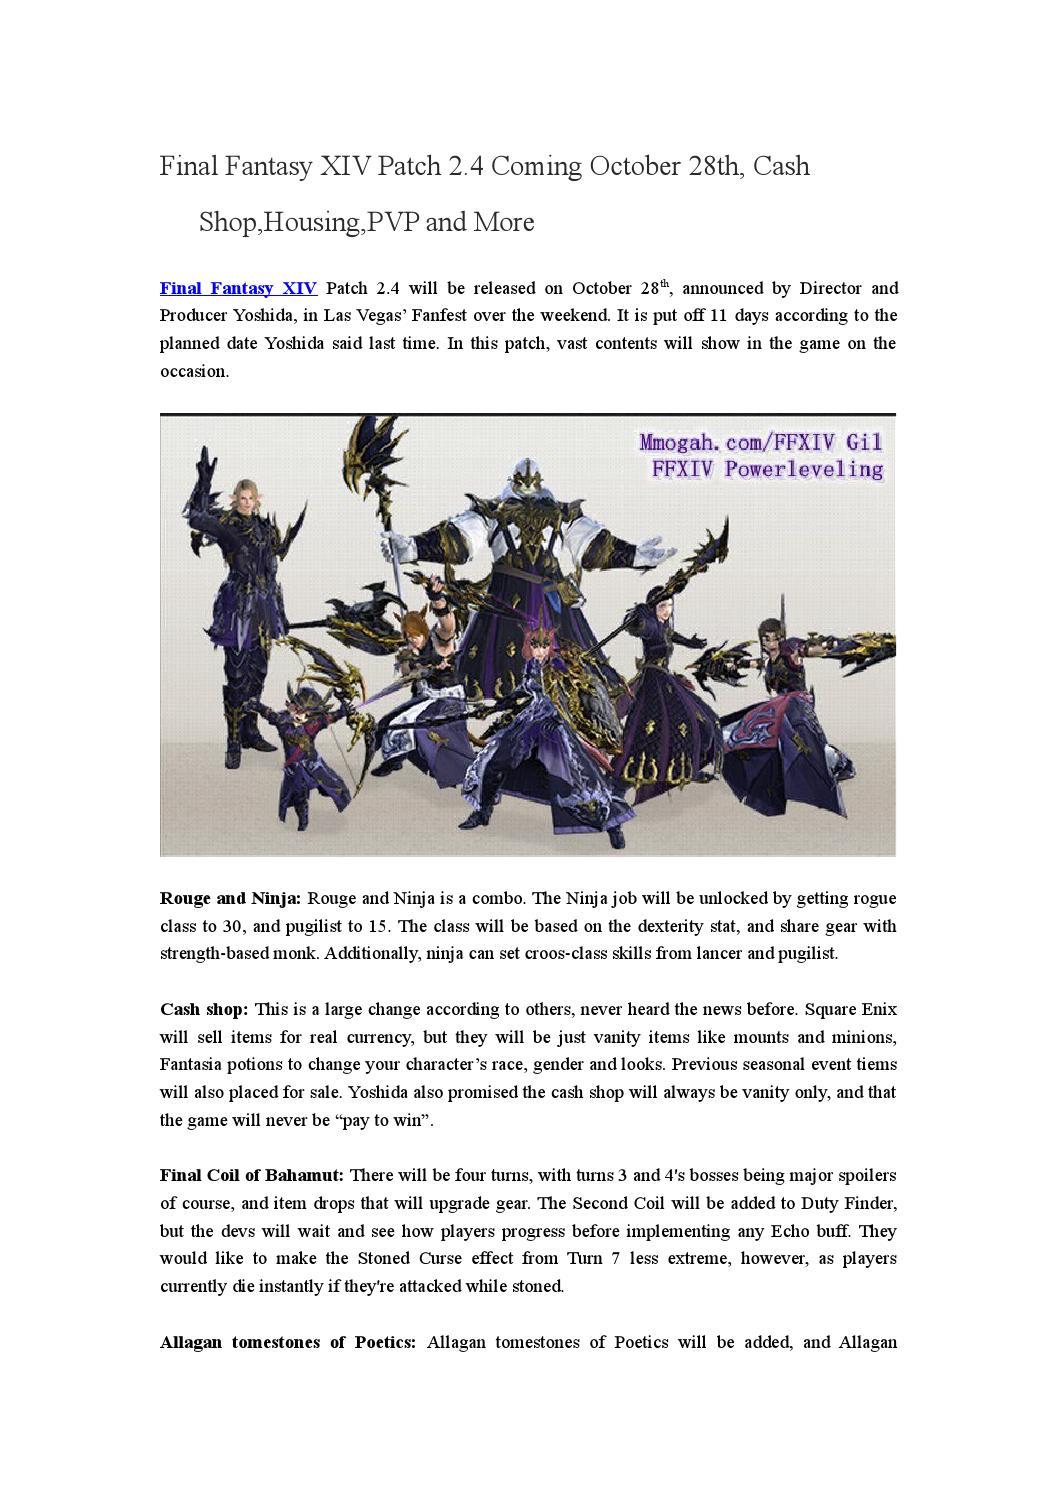 Final Fantasy XIV Patch 2 4 Coming October 28th, Cash Shop,Housing